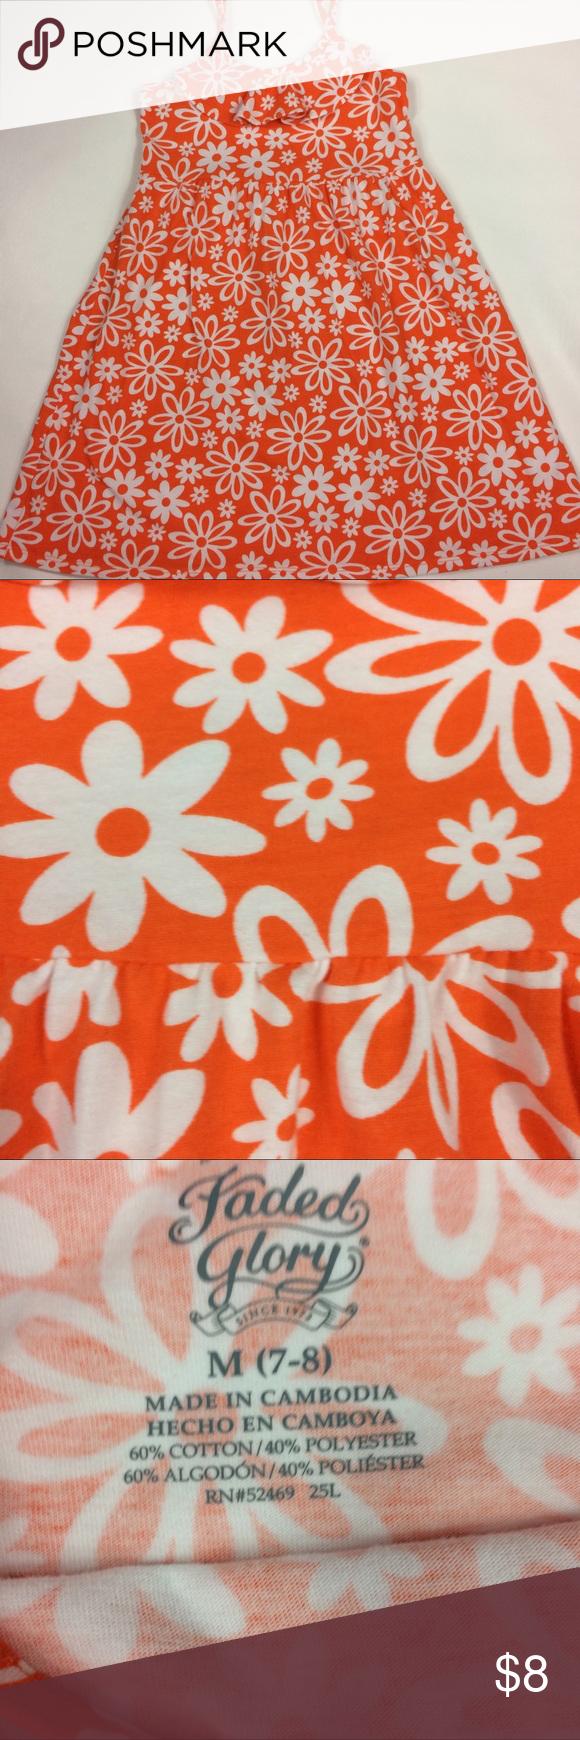 Orange dress casual  Orange Floral Girls Sundress Please see photos Dresses Casual  My